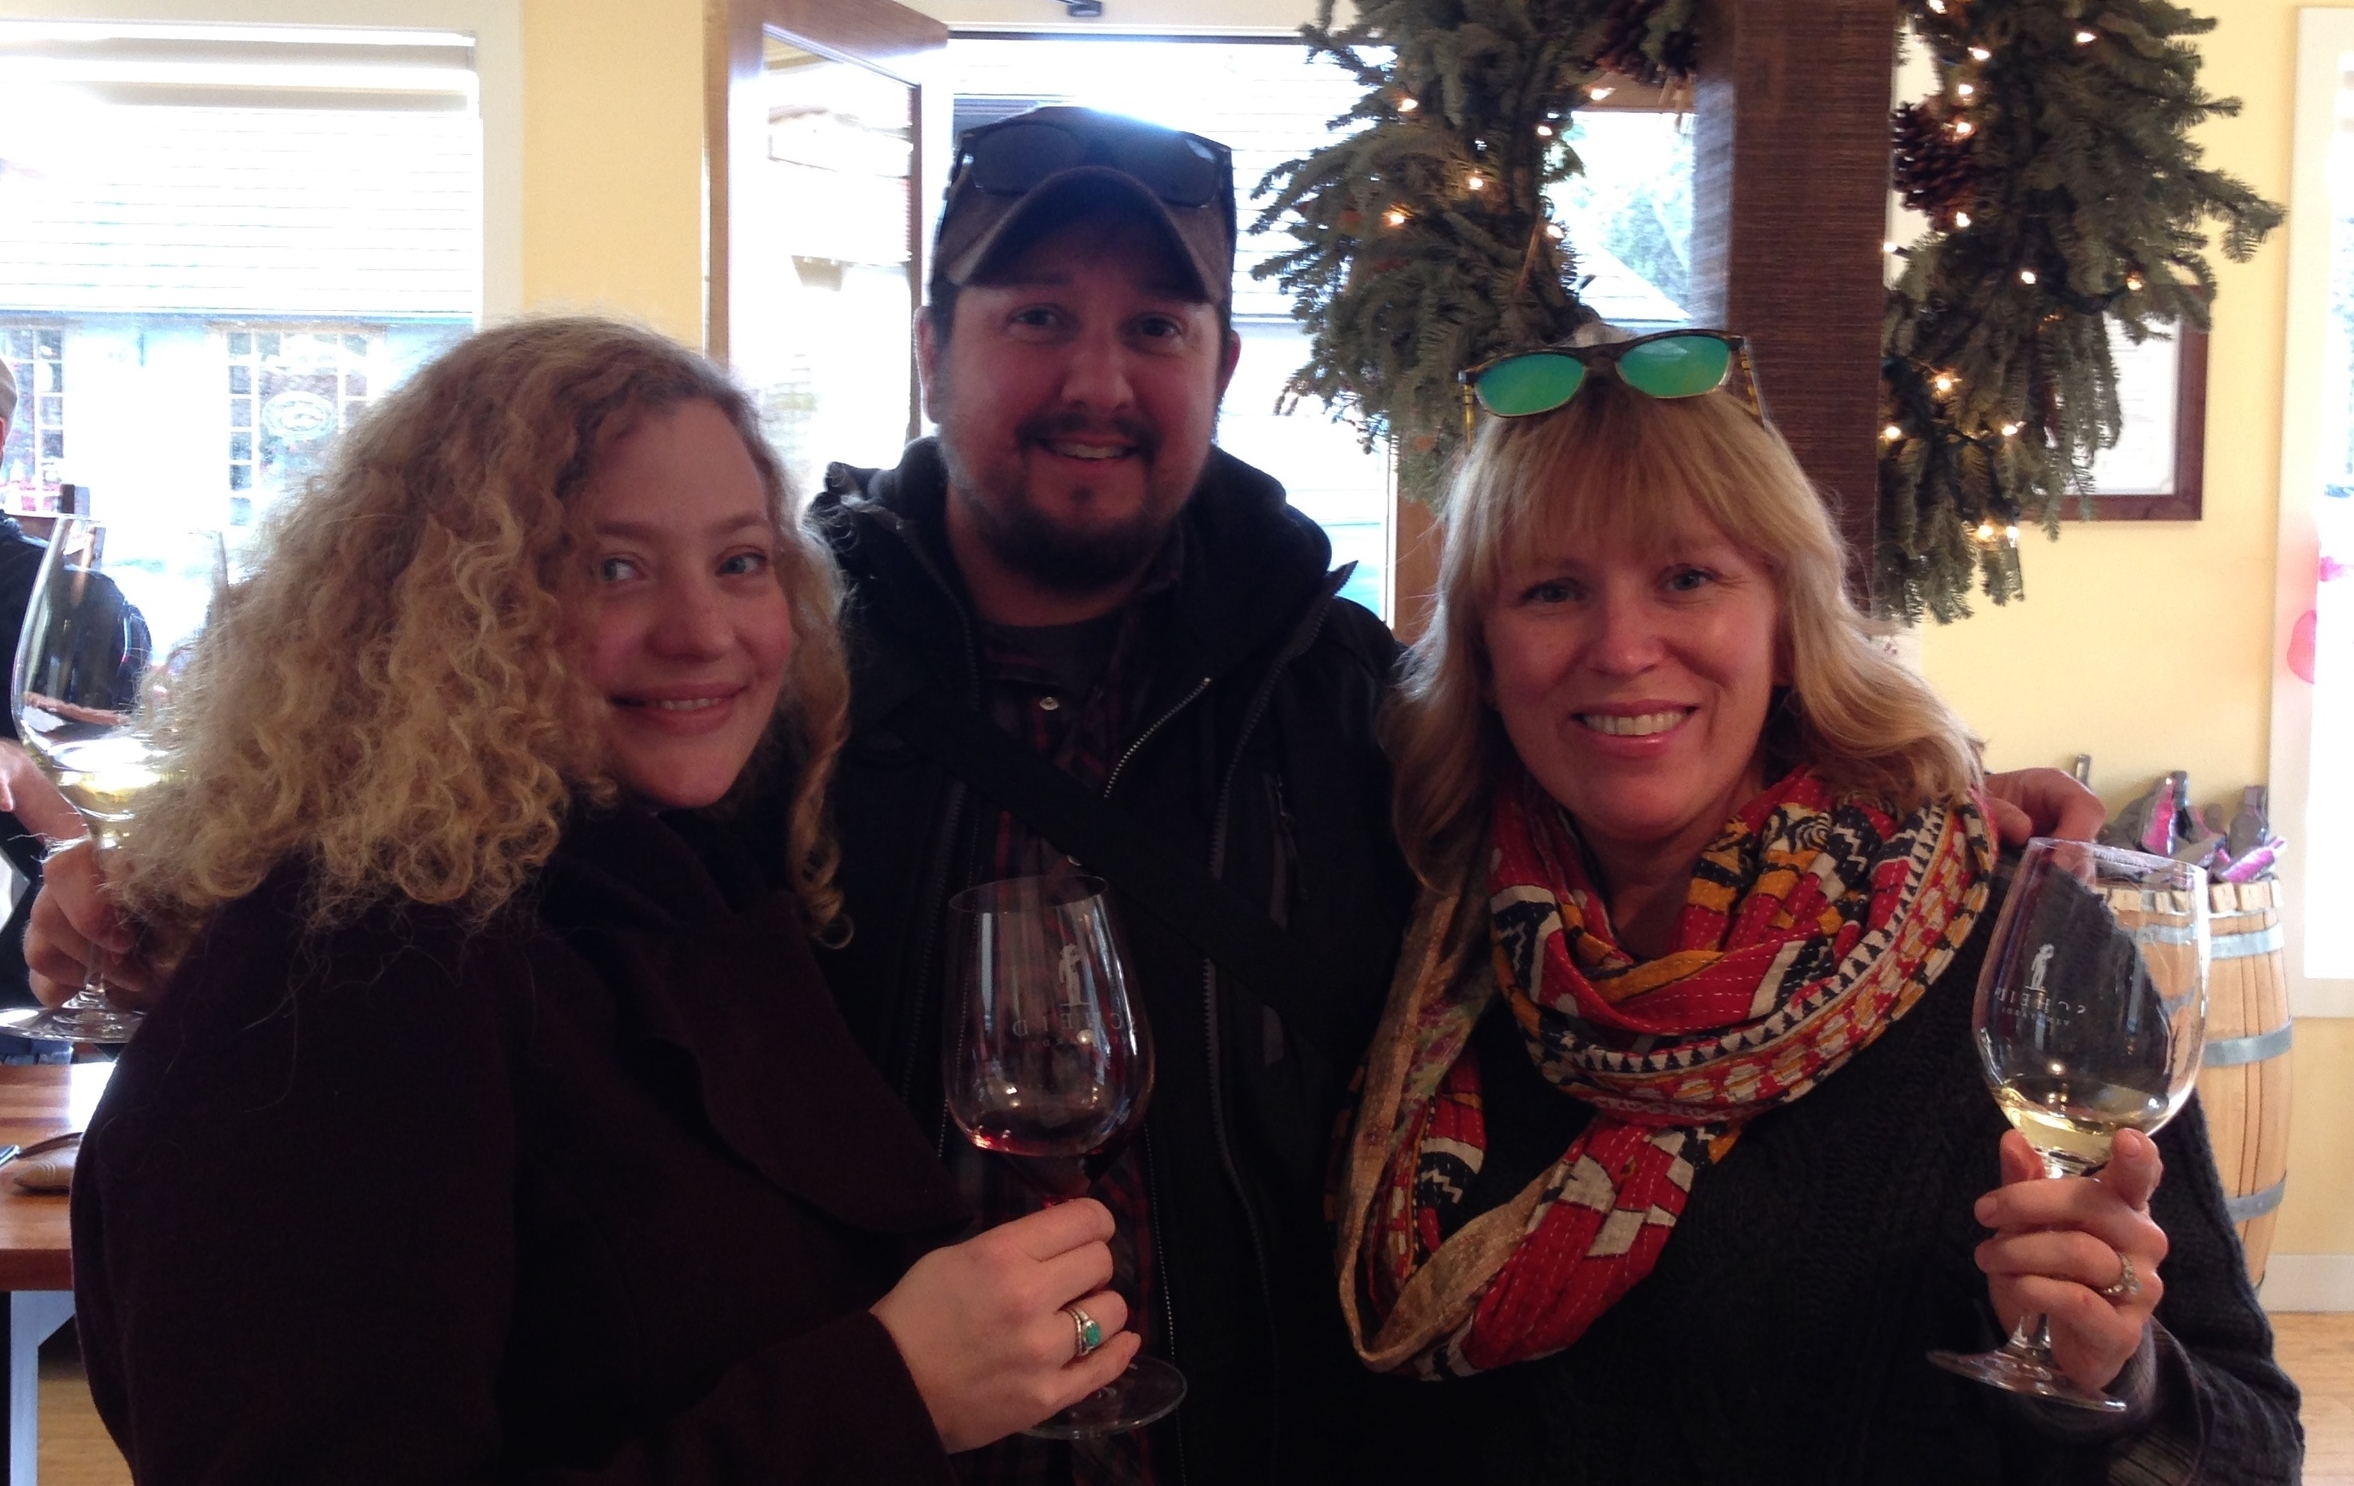 Myself, Gabe and Jen feeling festive at Scheid's Carmel-by-the-Sea Tasting Room.